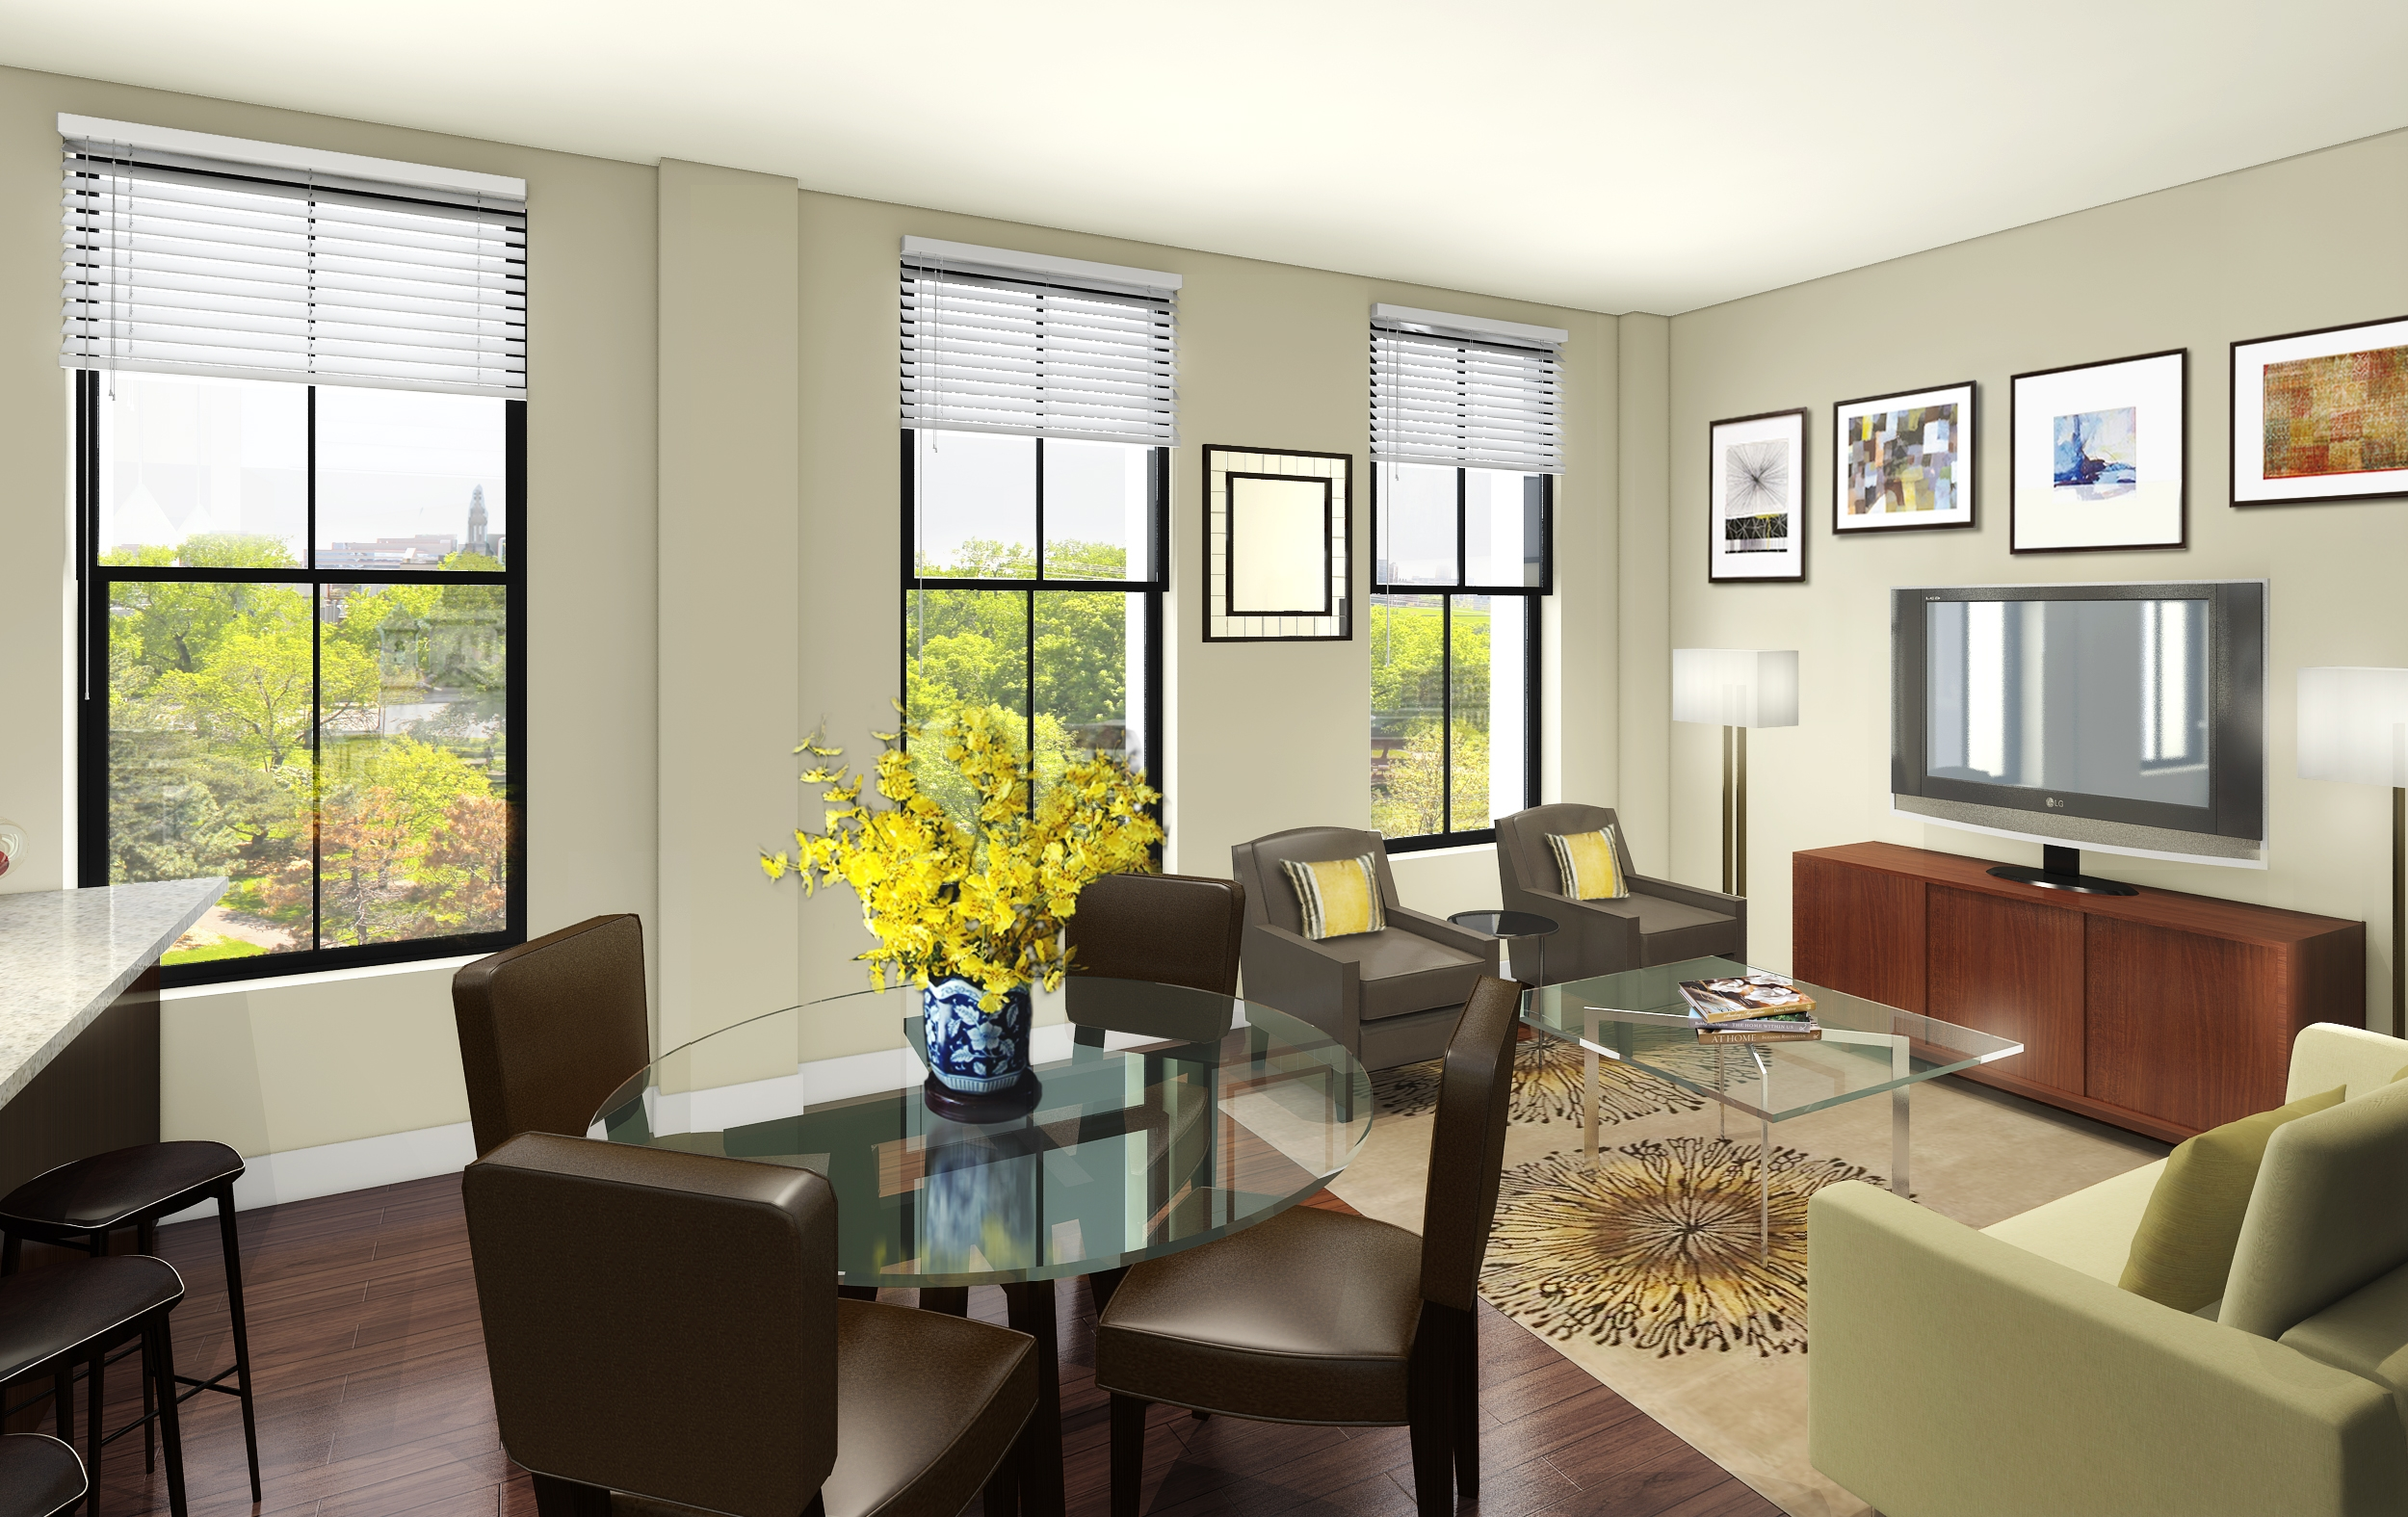 Elegant Home Living Room Gallery   3D House Designs   Veerle.us Good Ideas